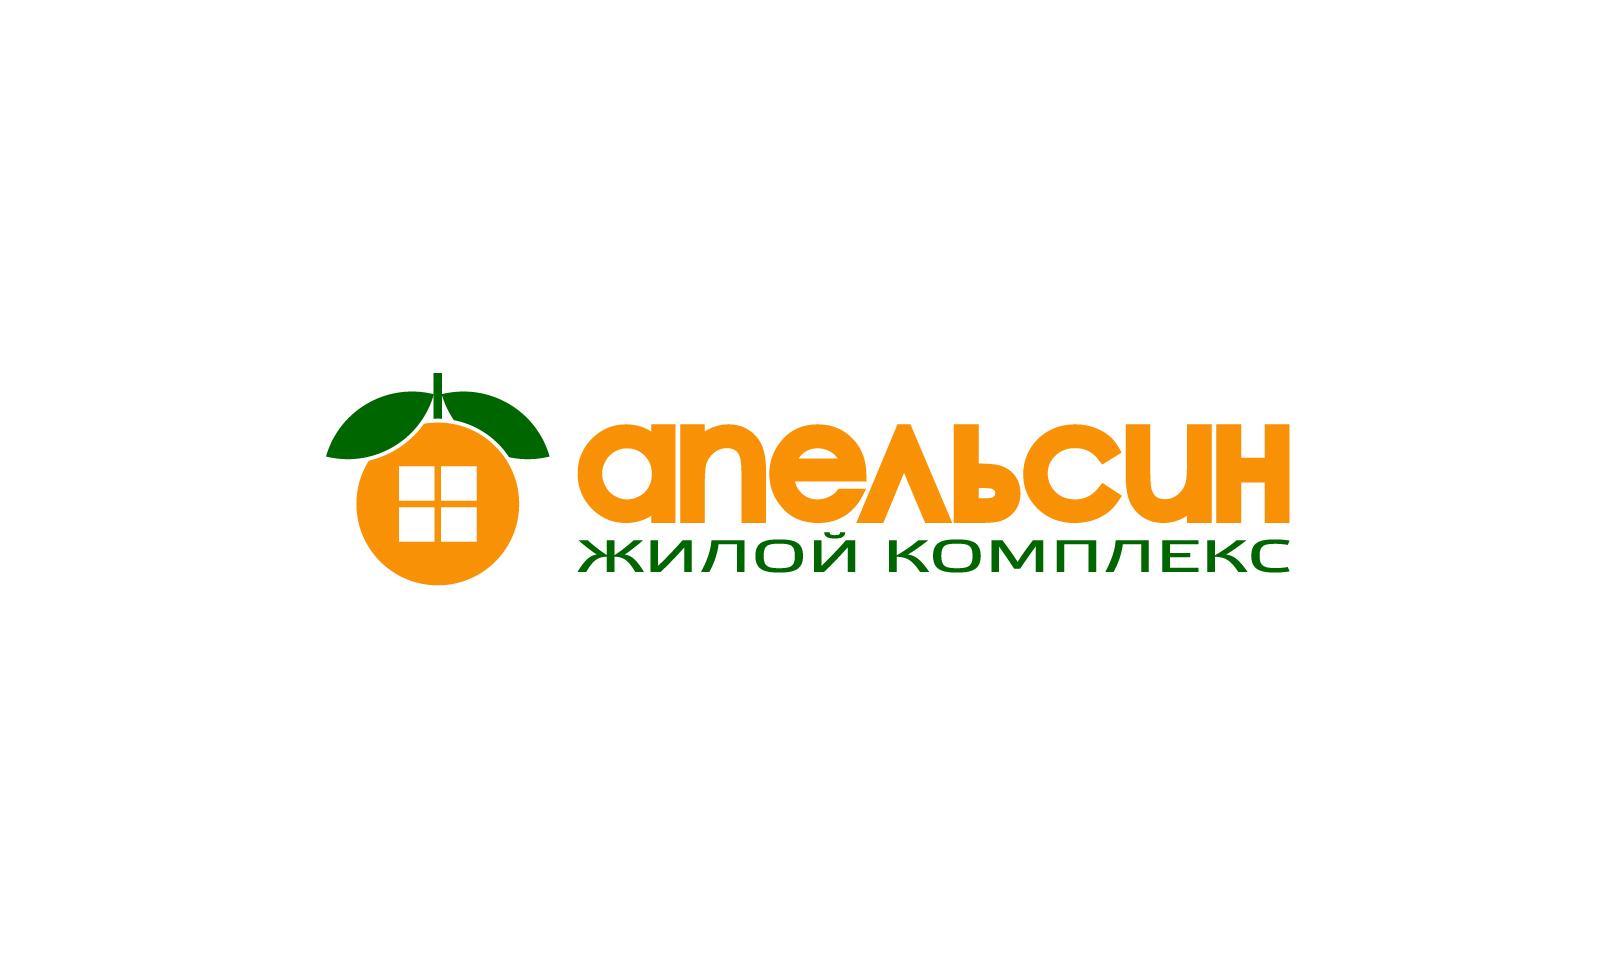 Логотип и фирменный стиль фото f_2445a58dddf2c6f4.jpg